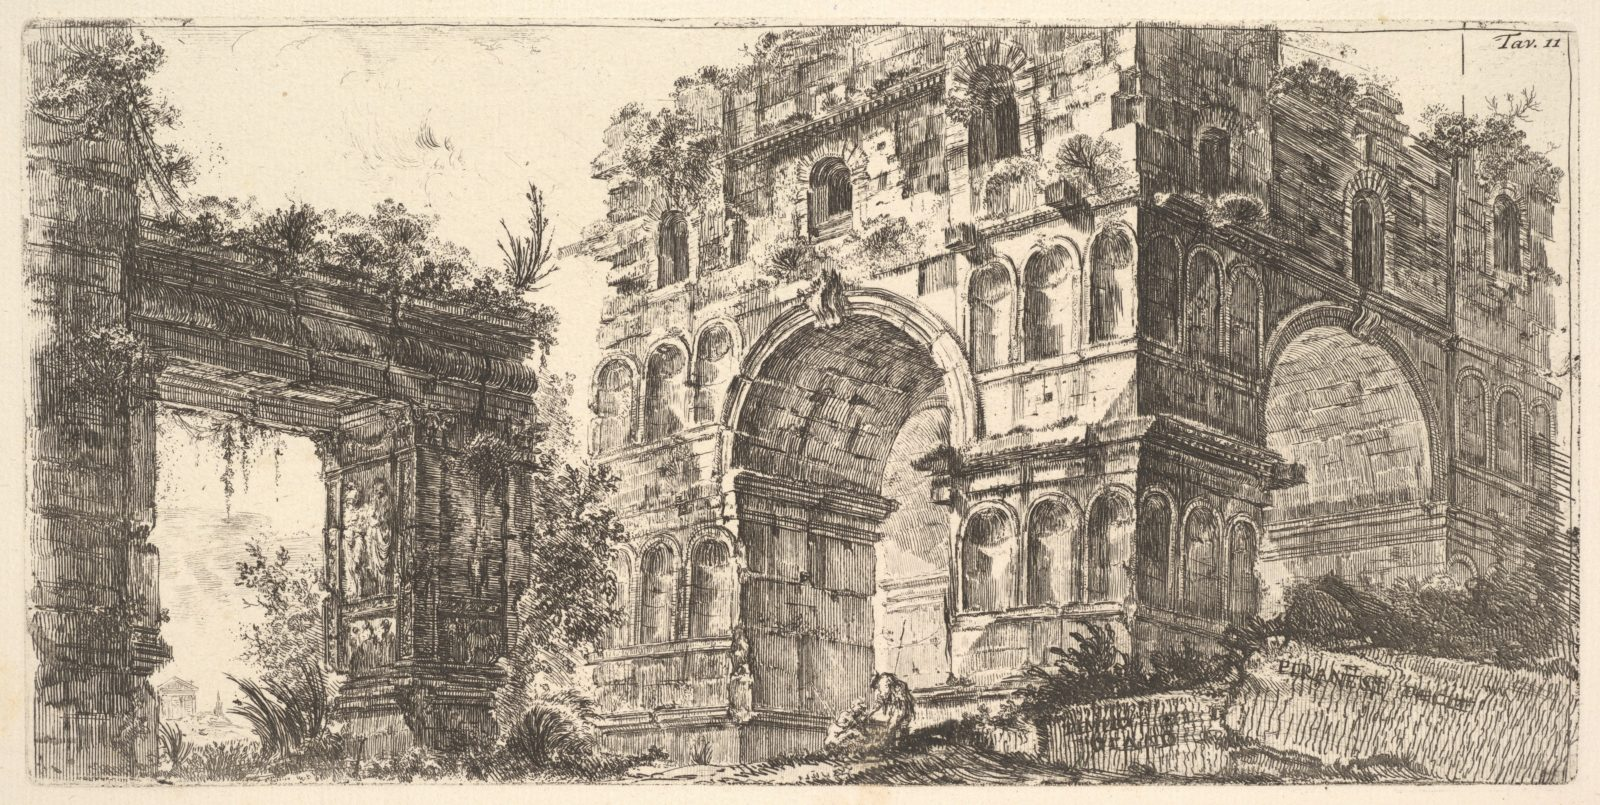 Plate 11: Temple of Janus (Tempio di Giano) from the series 'Antichita Romana'